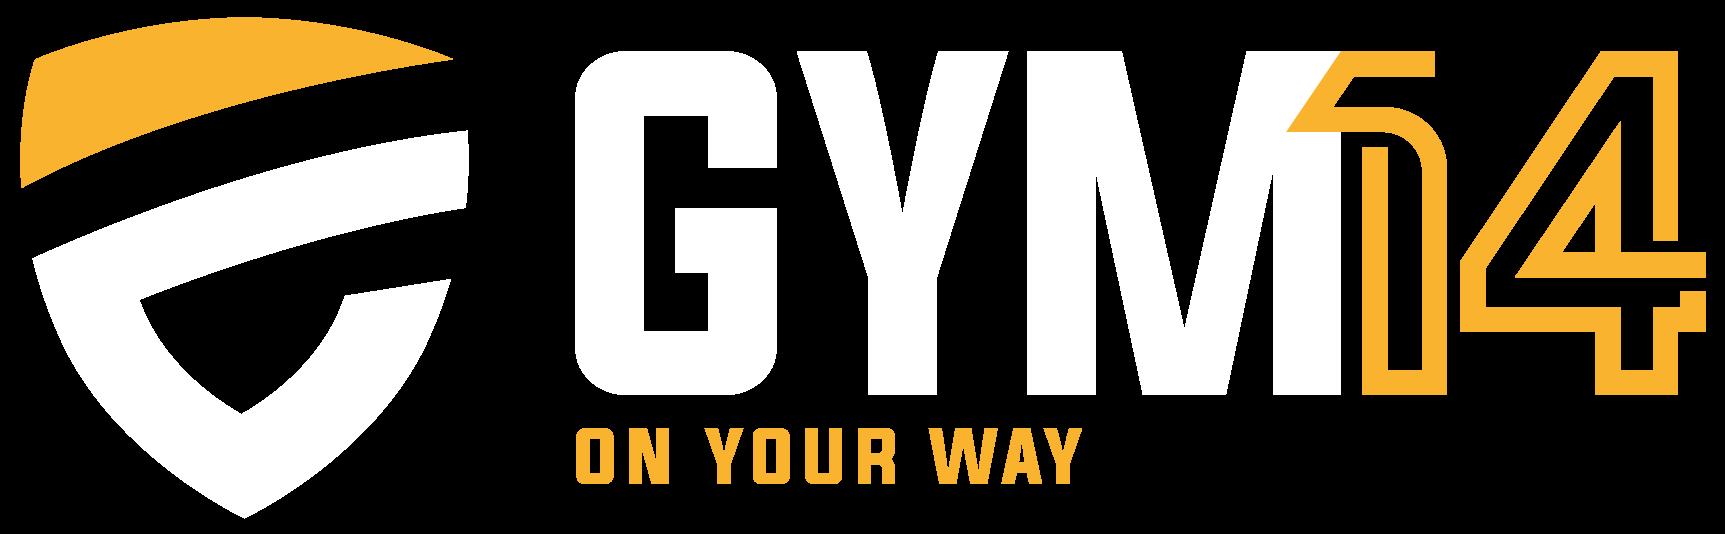 website logo wit gym14